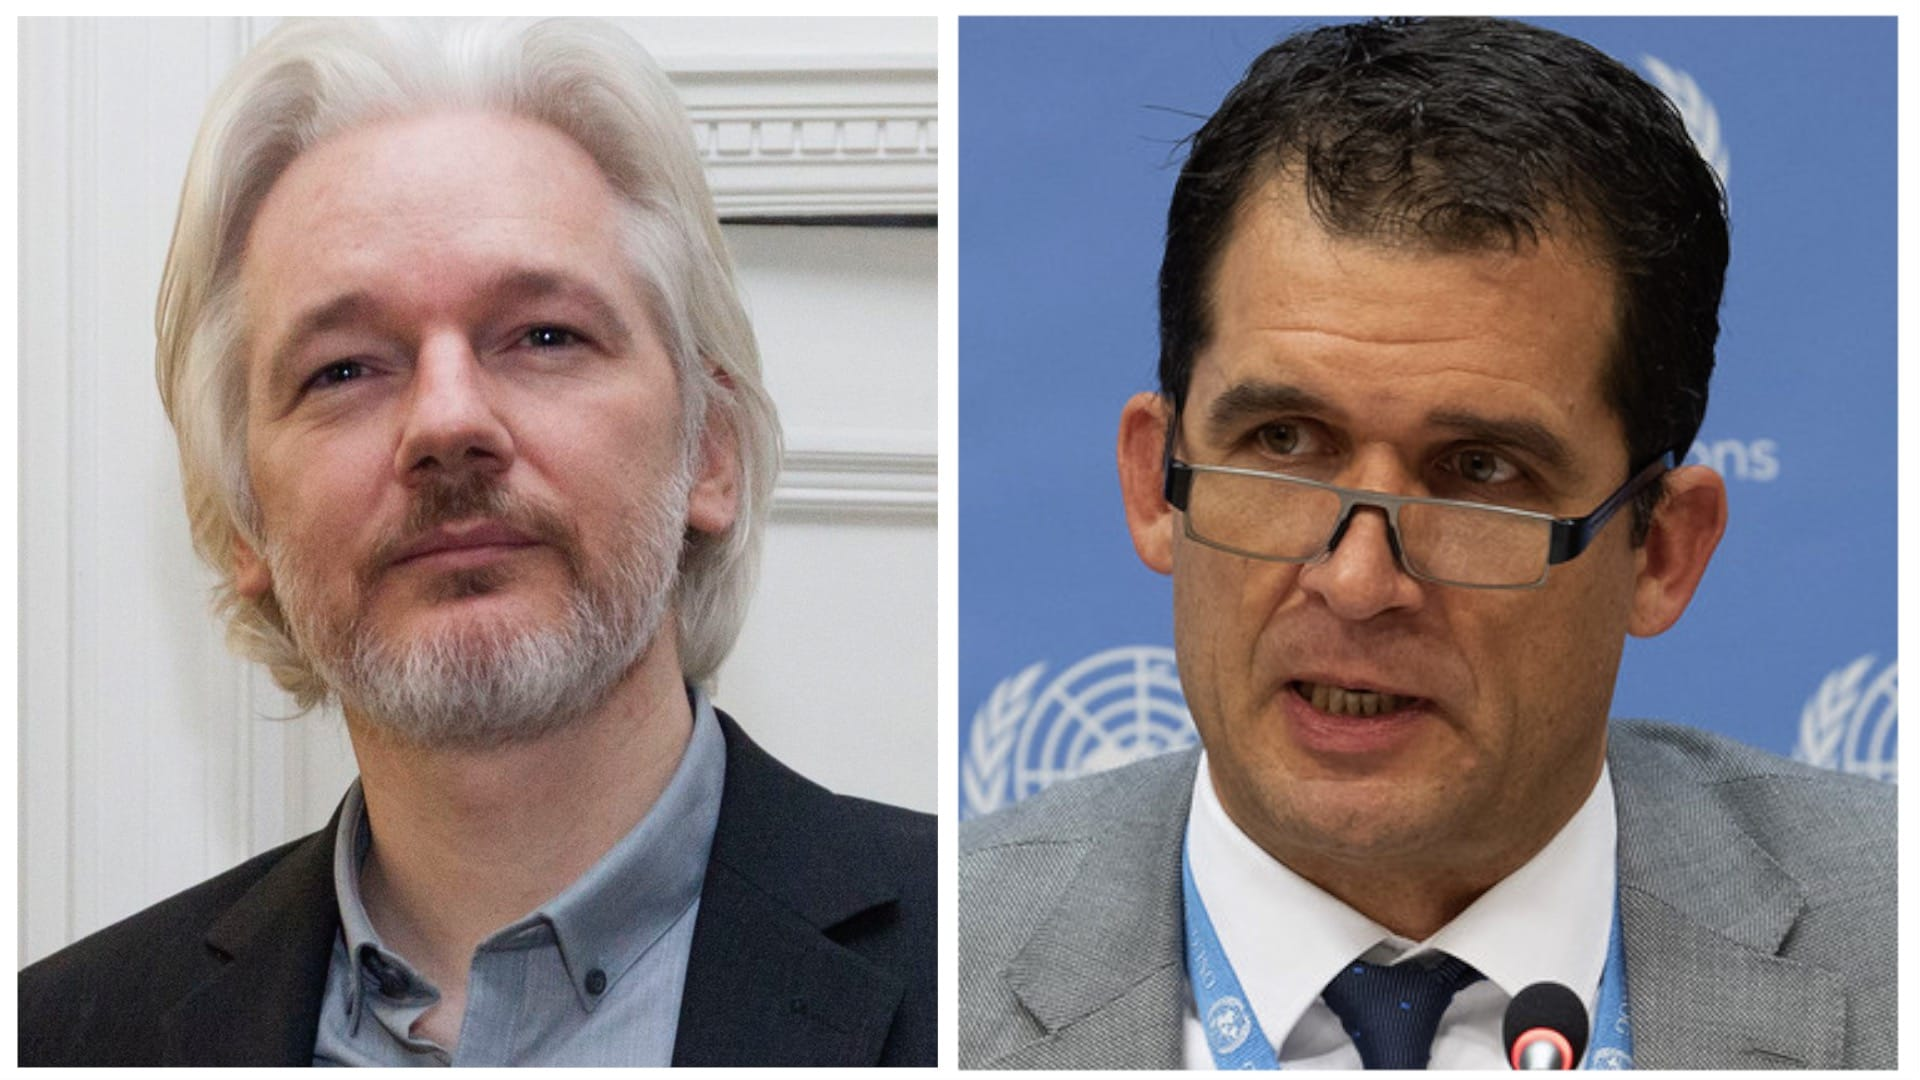 Nils Melzer Torture Assange